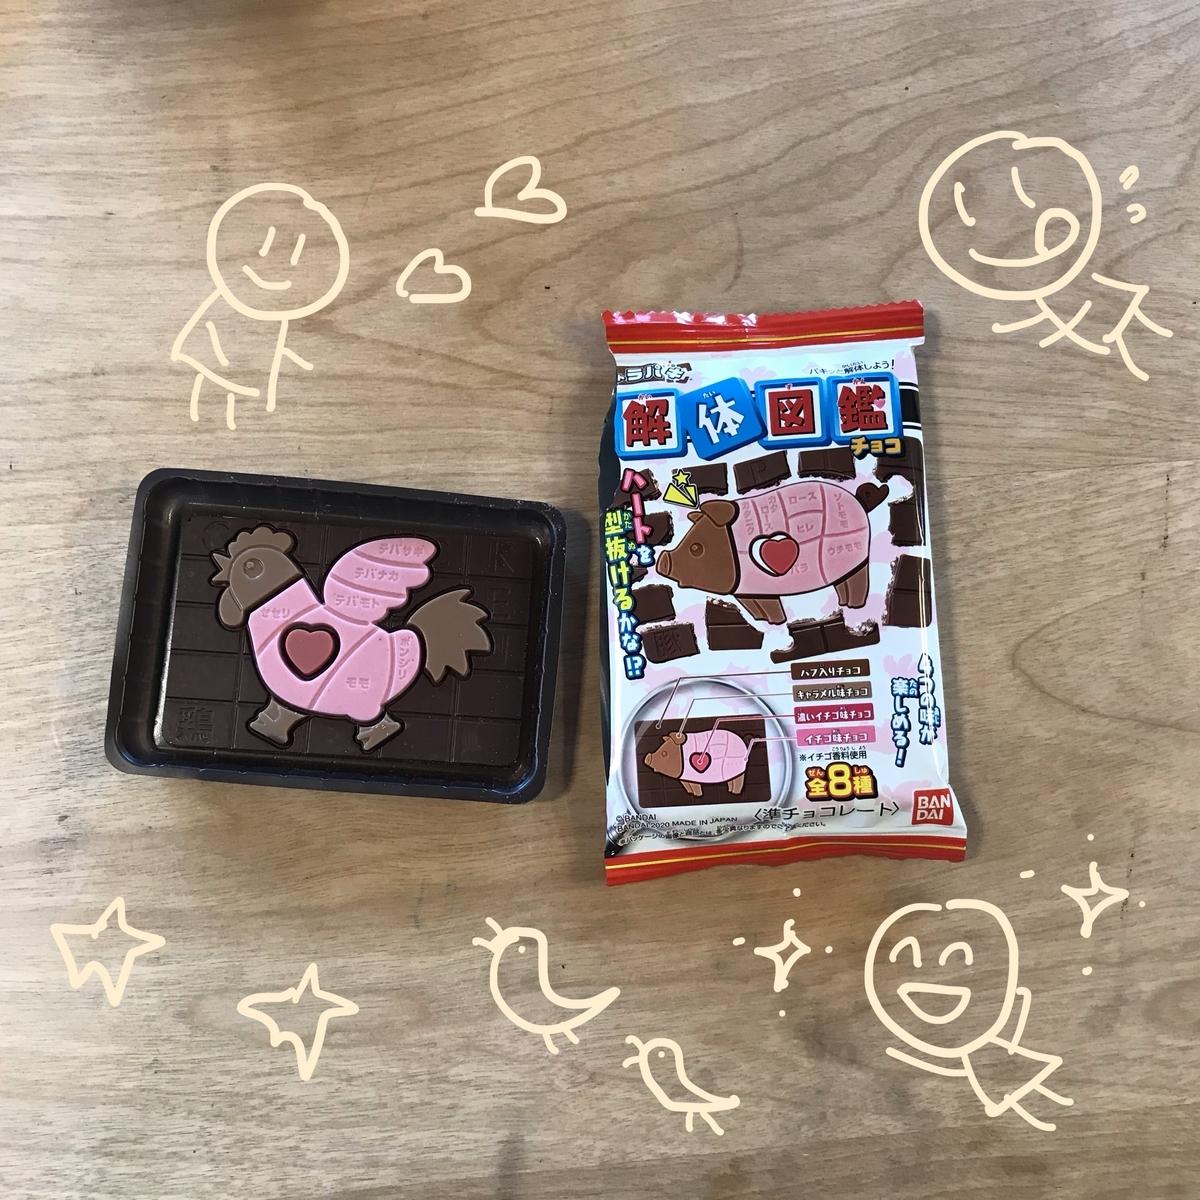 f:id:gummychocolate:20210122150920j:plain